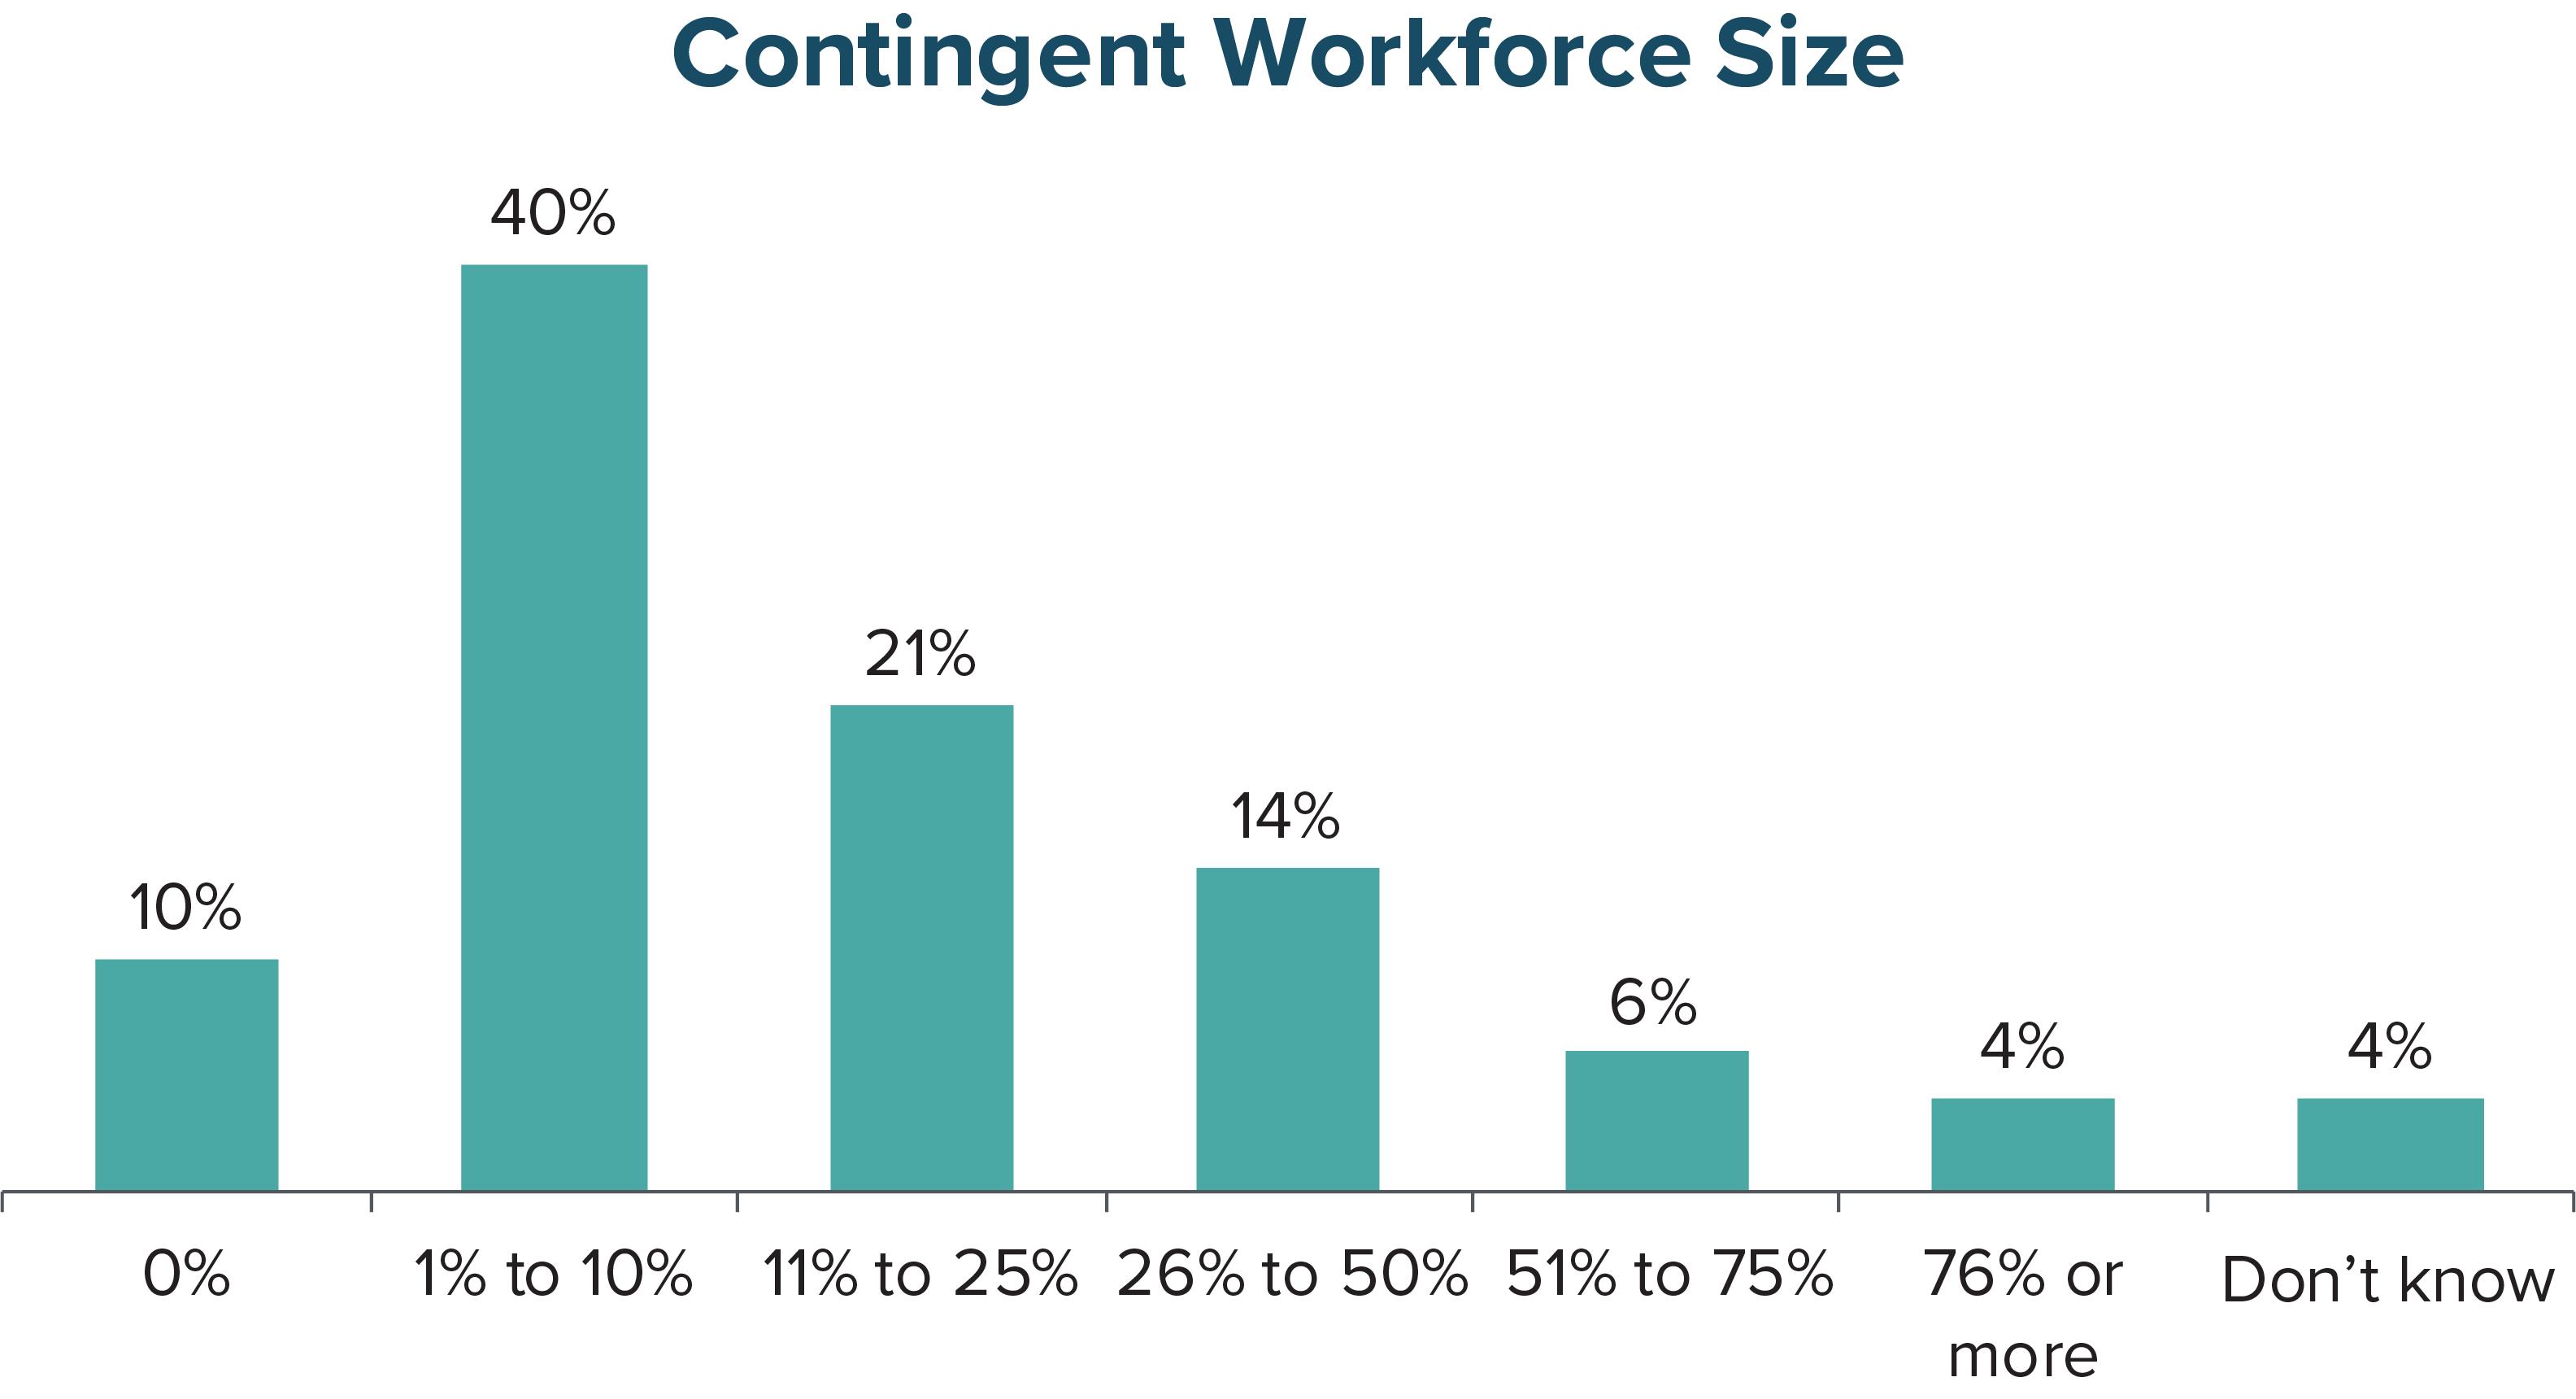 Contingent Workforce Size